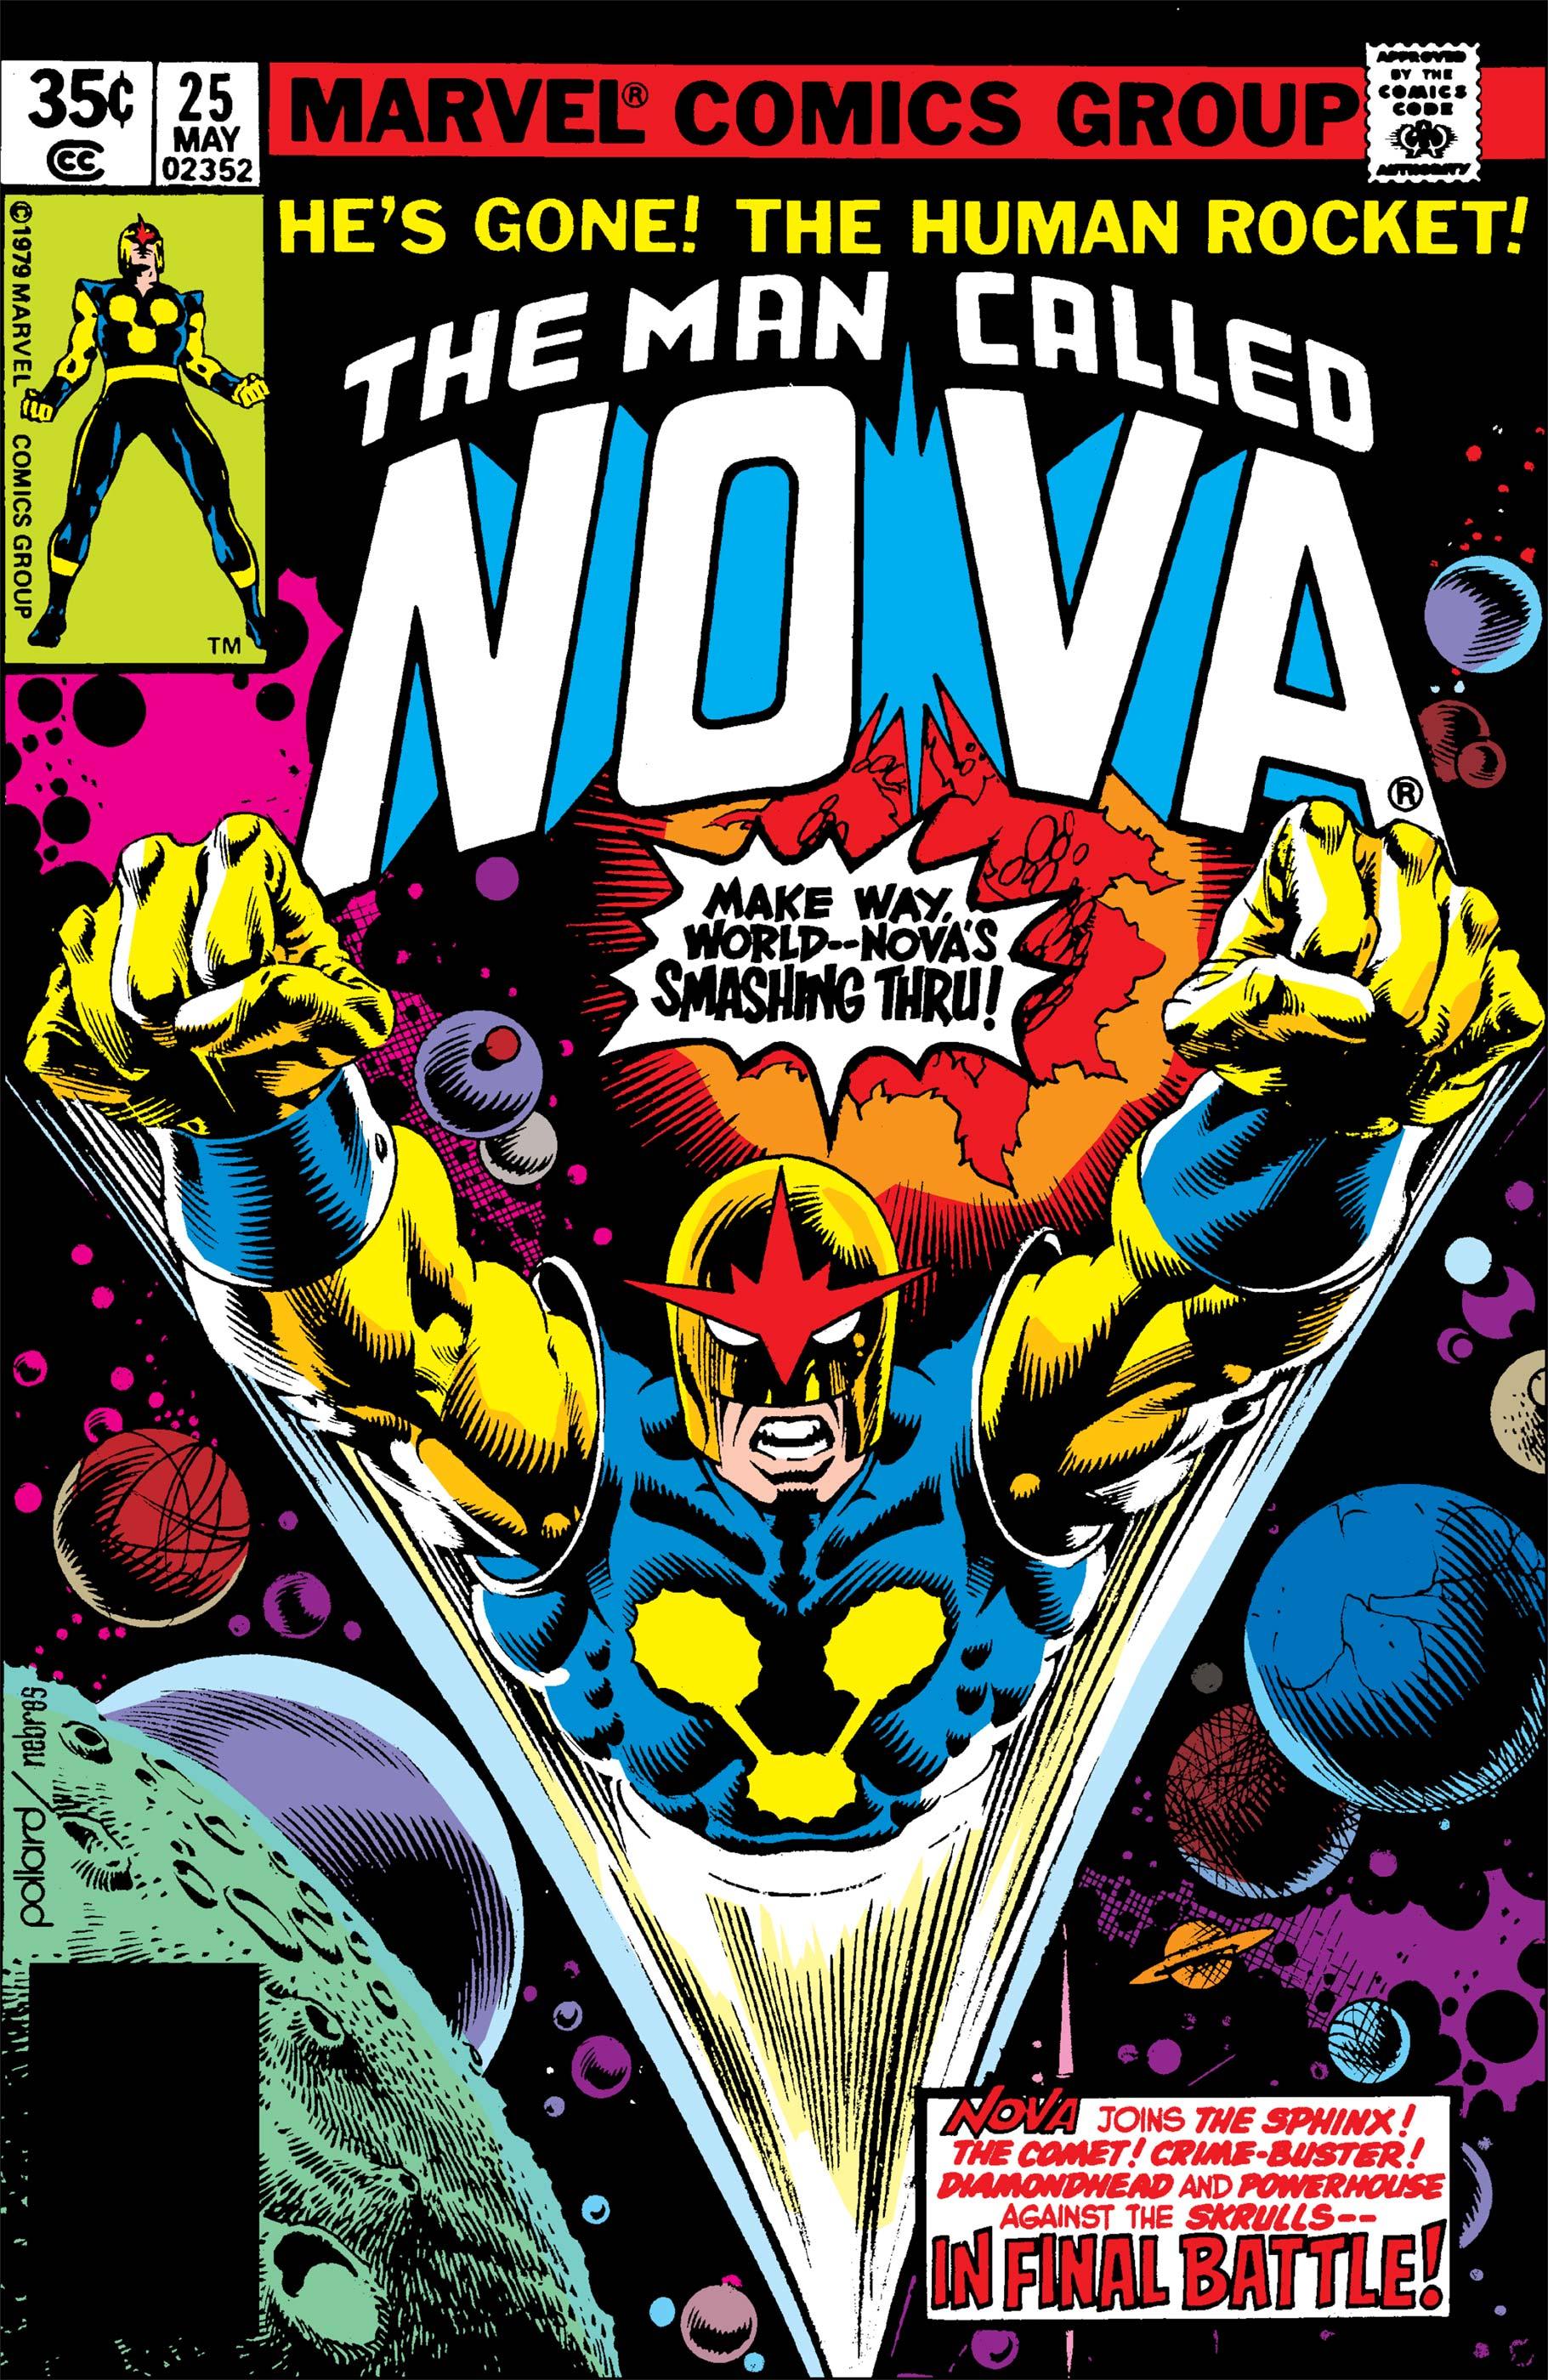 Nova (1976) #25